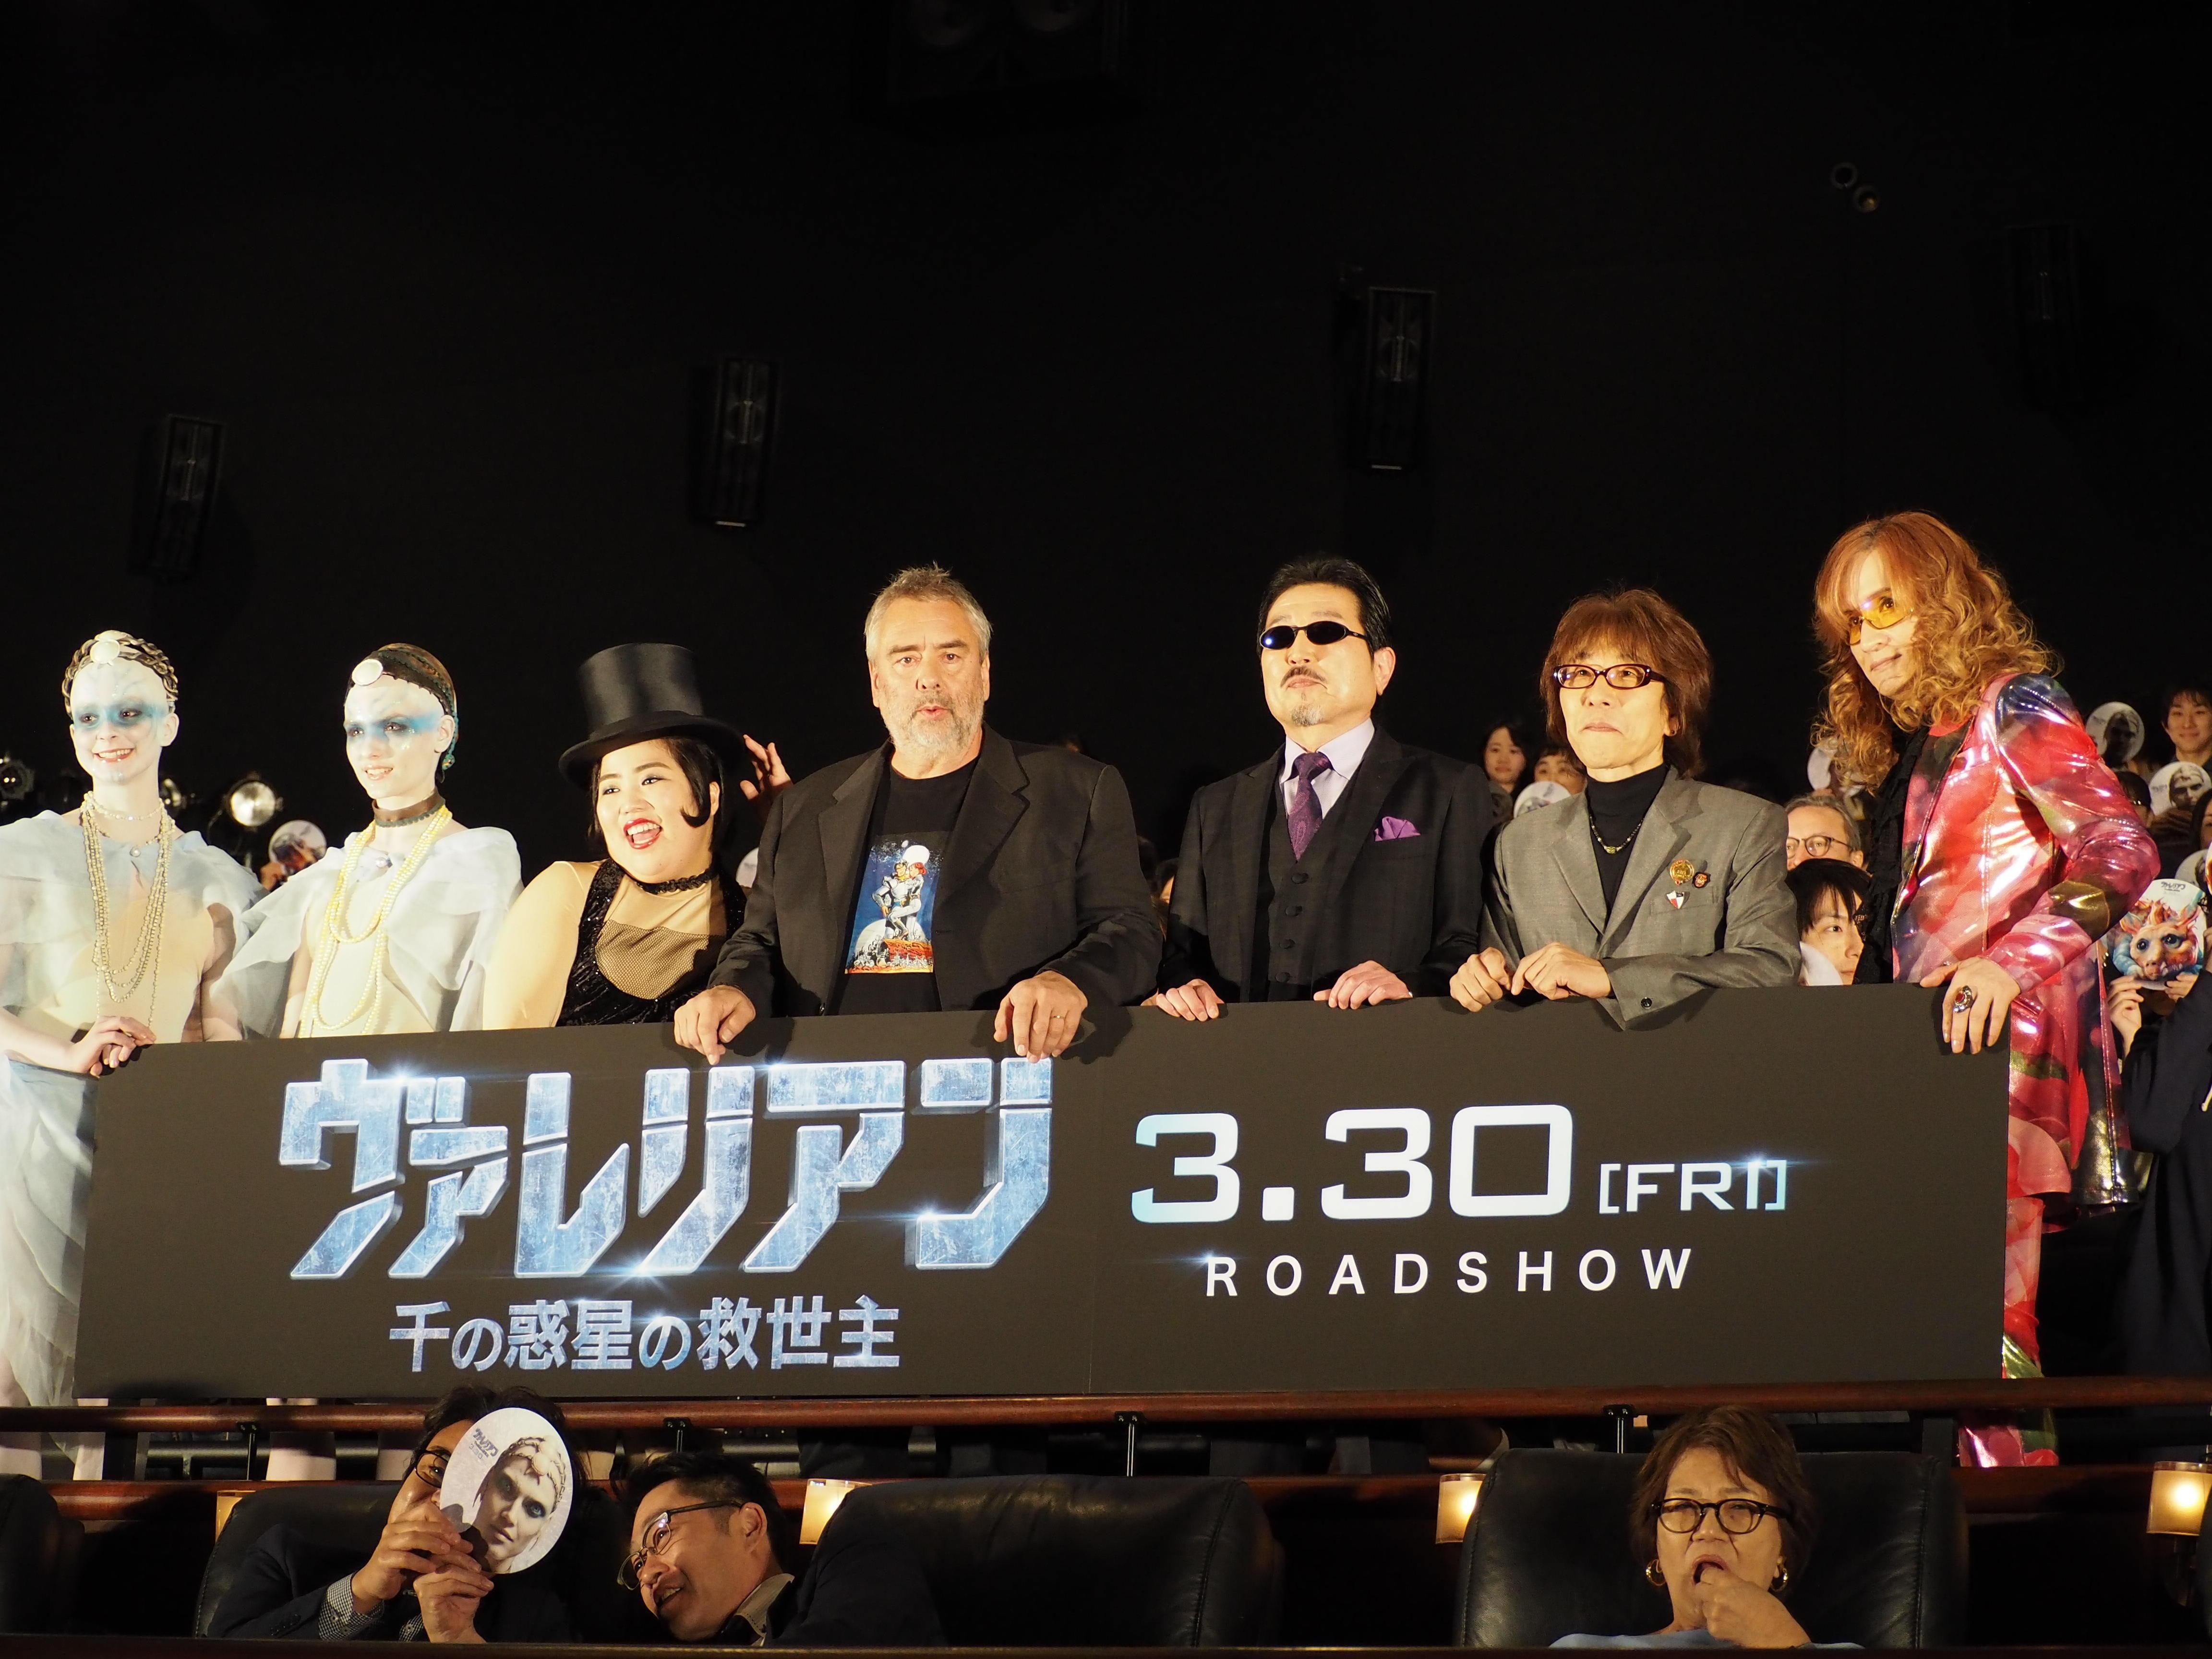 http://news.yoshimoto.co.jp/20180314142458-6b942b18b2e875d265583136a75680969715f2eb.jpg